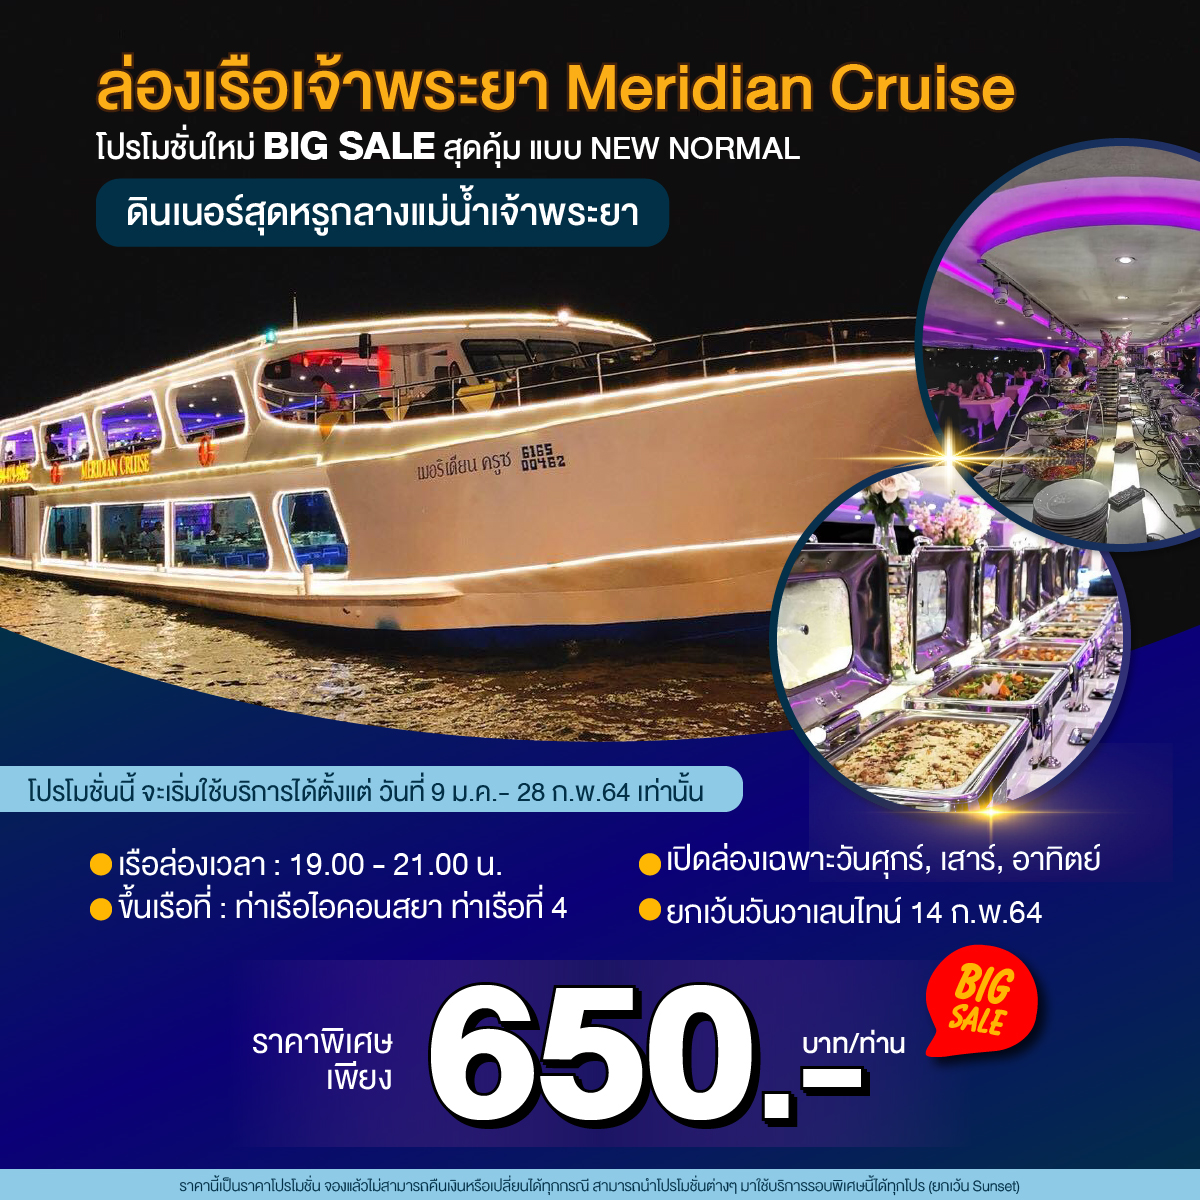 BIG SALE รอบพิเศษเมอริเดียน ครูซส์ (Meridian Cruise BIG SALE)